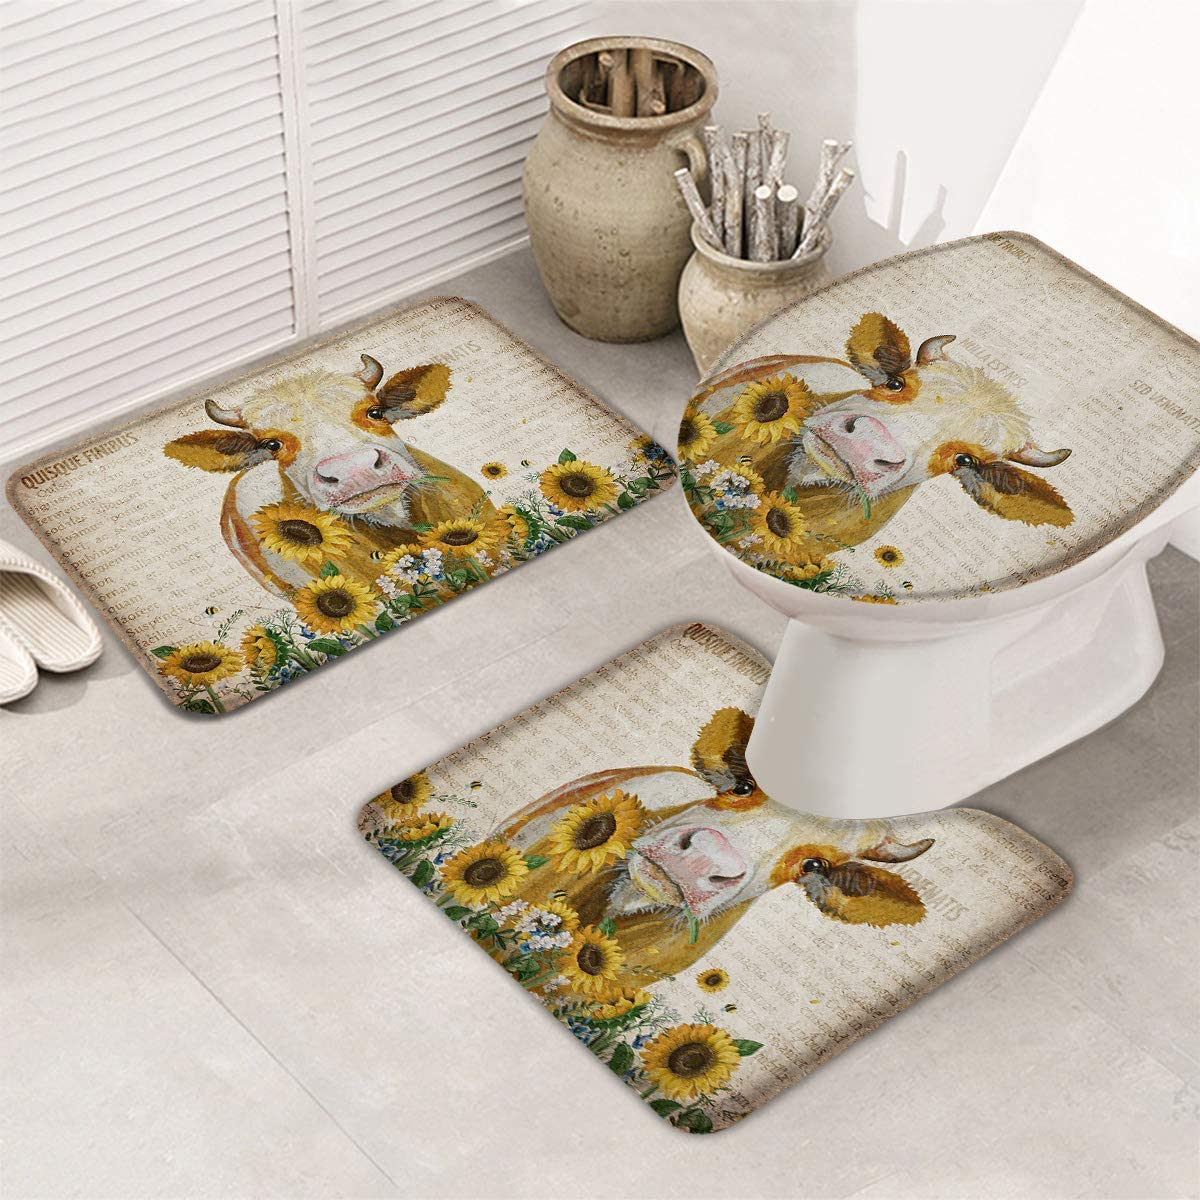 3 Piece Bathroom Rugs Max 86% OFF Set Bath Mat V Cows Sunflower On Farm Cute All items free shipping